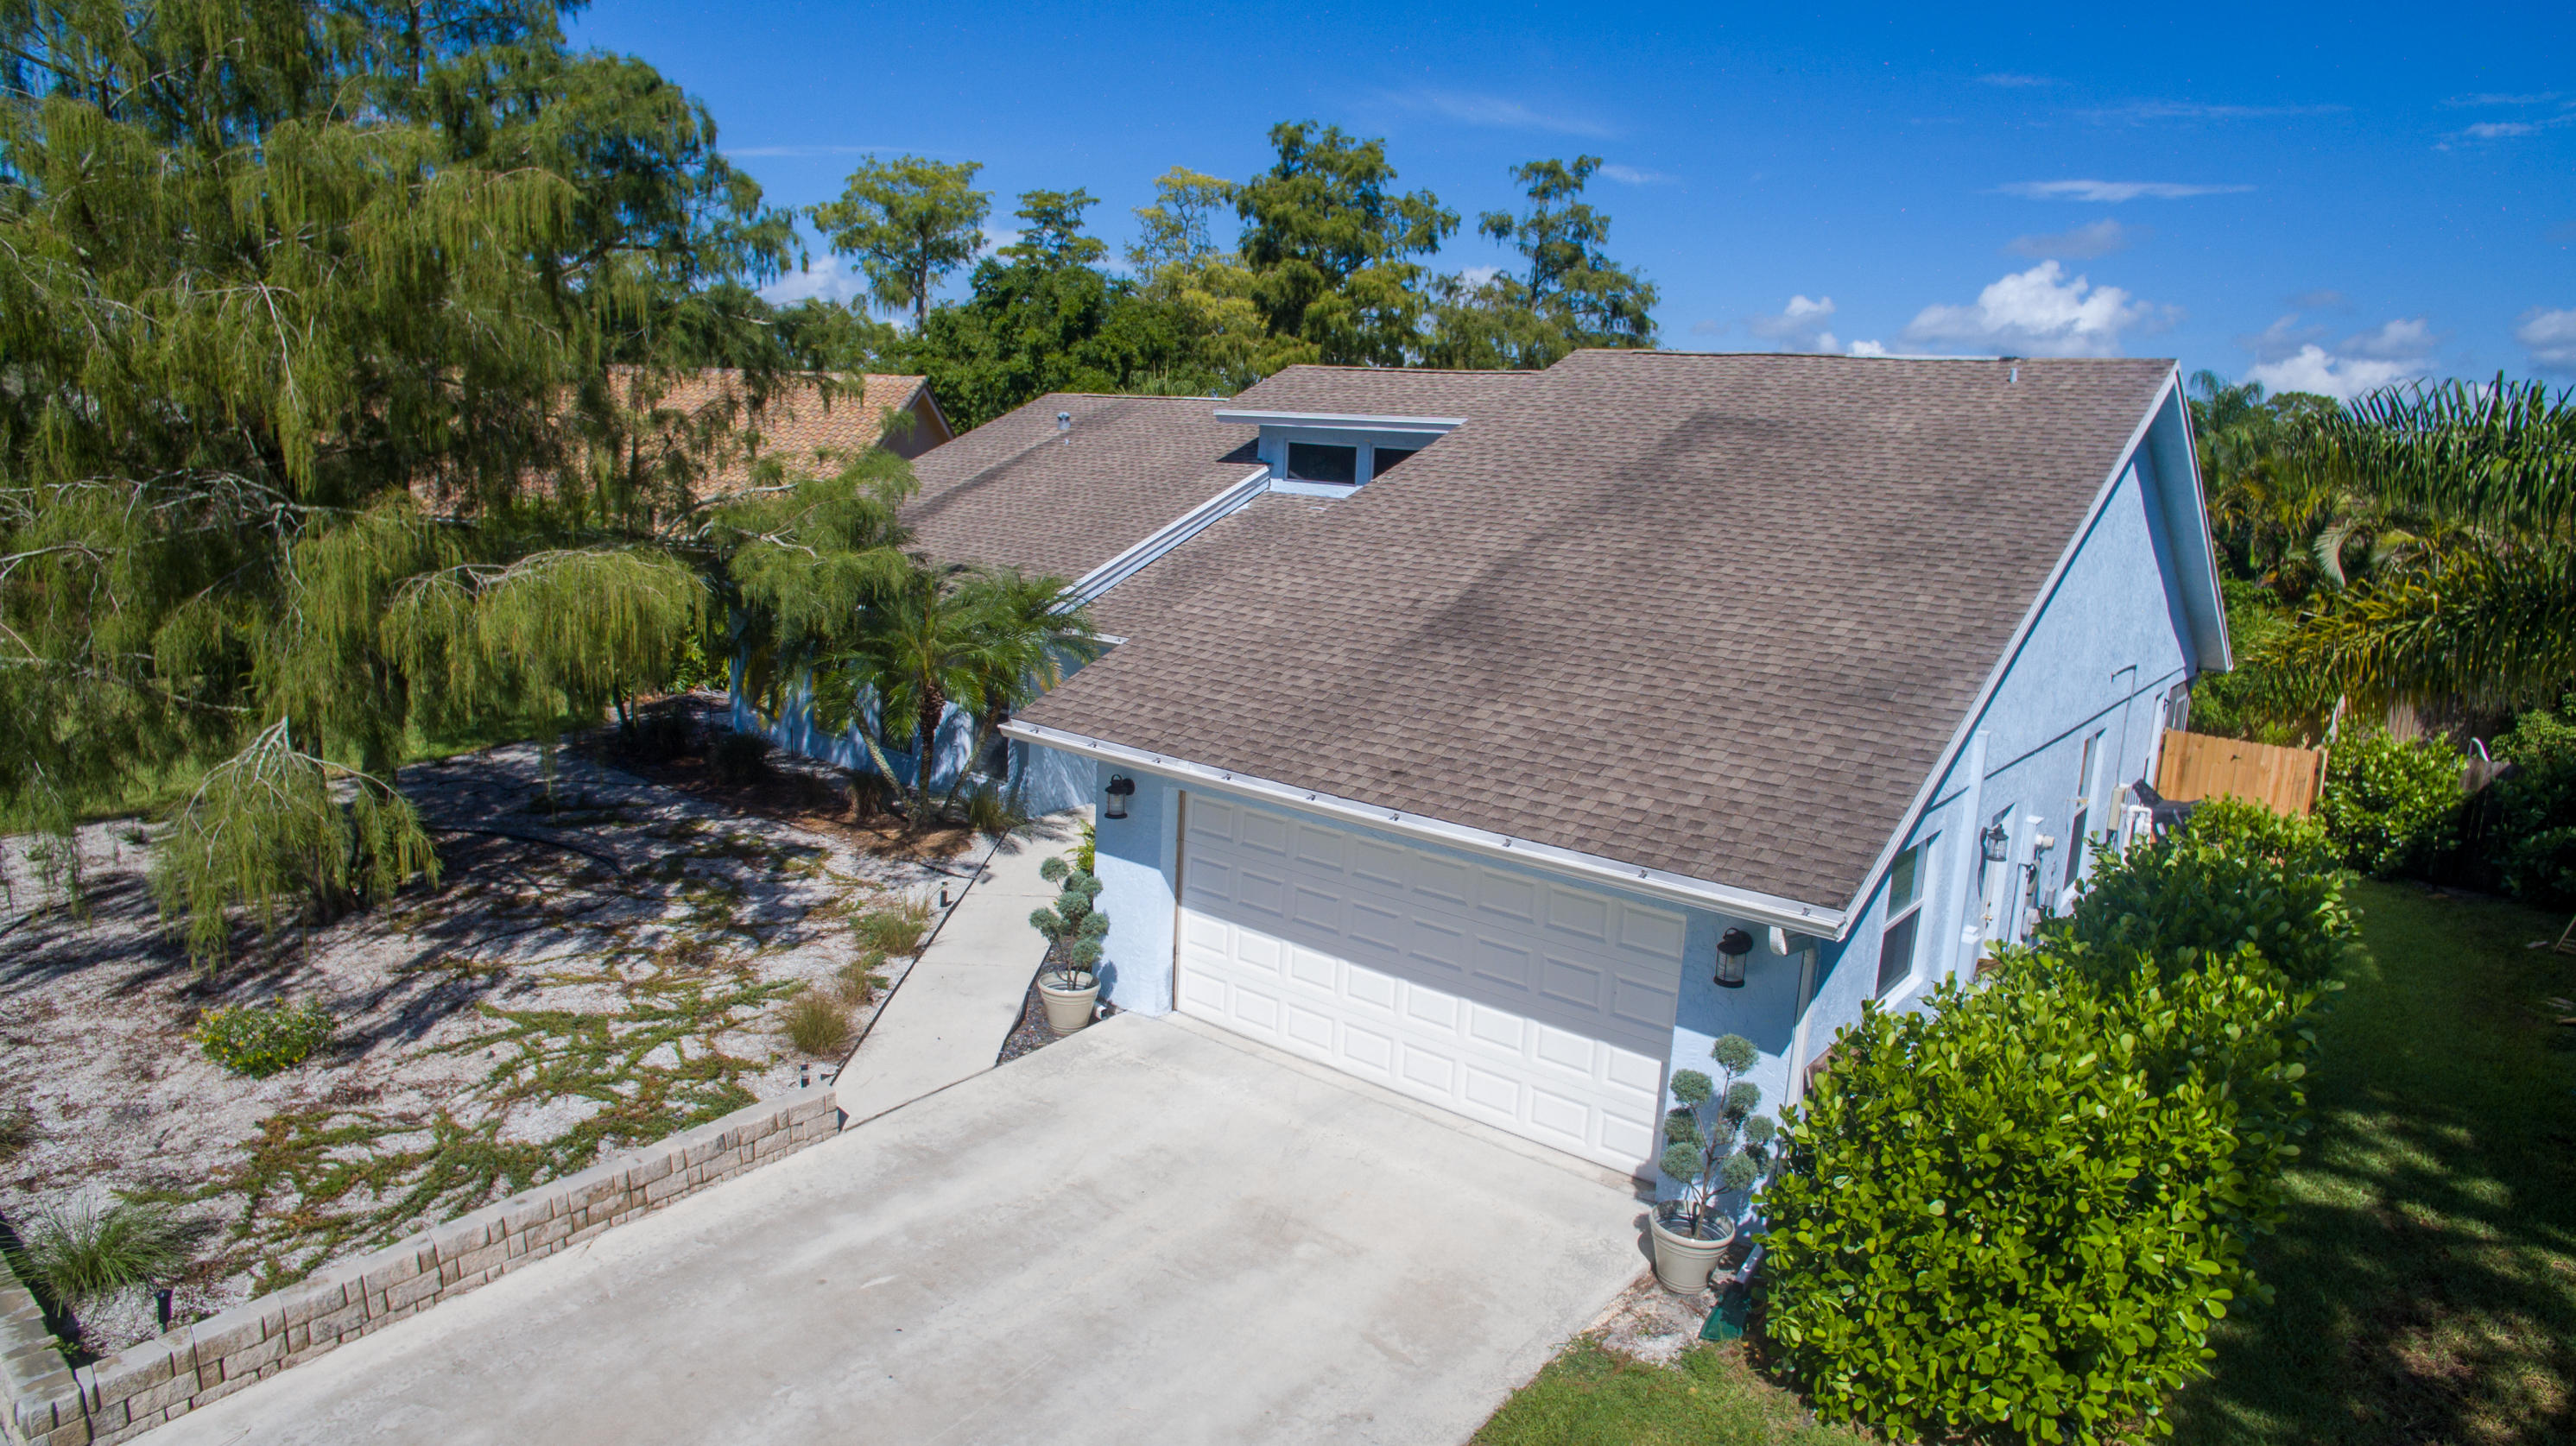 900 Cosmos Court, Wellington, Florida 33414, 3 Bedrooms Bedrooms, ,2 BathroomsBathrooms,Single Family,For Rent,Cosmos,1,RX-10554628